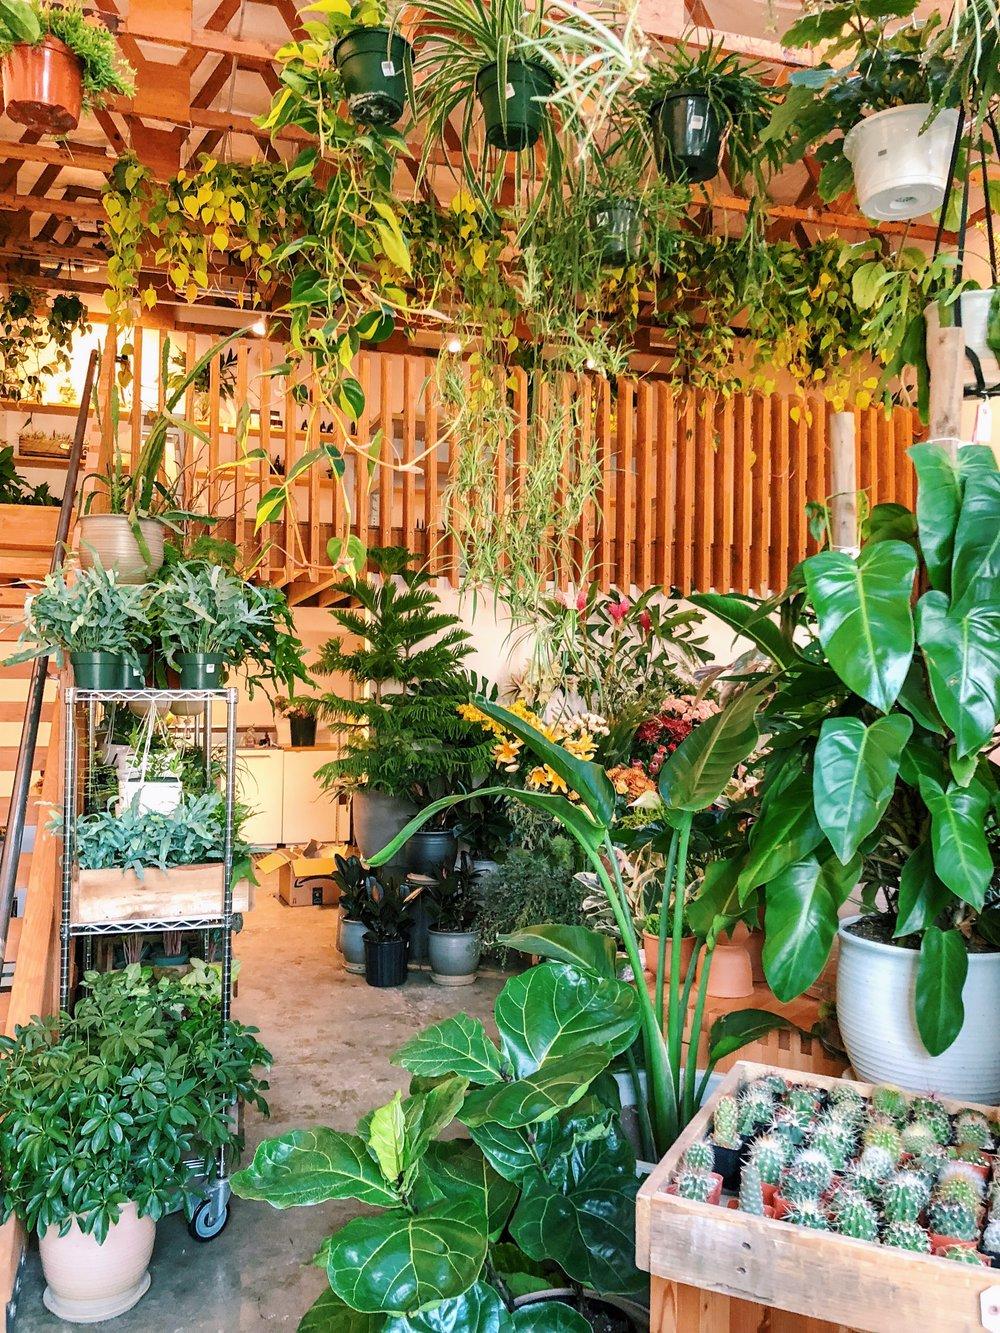 Solabee Plants and Botanicals